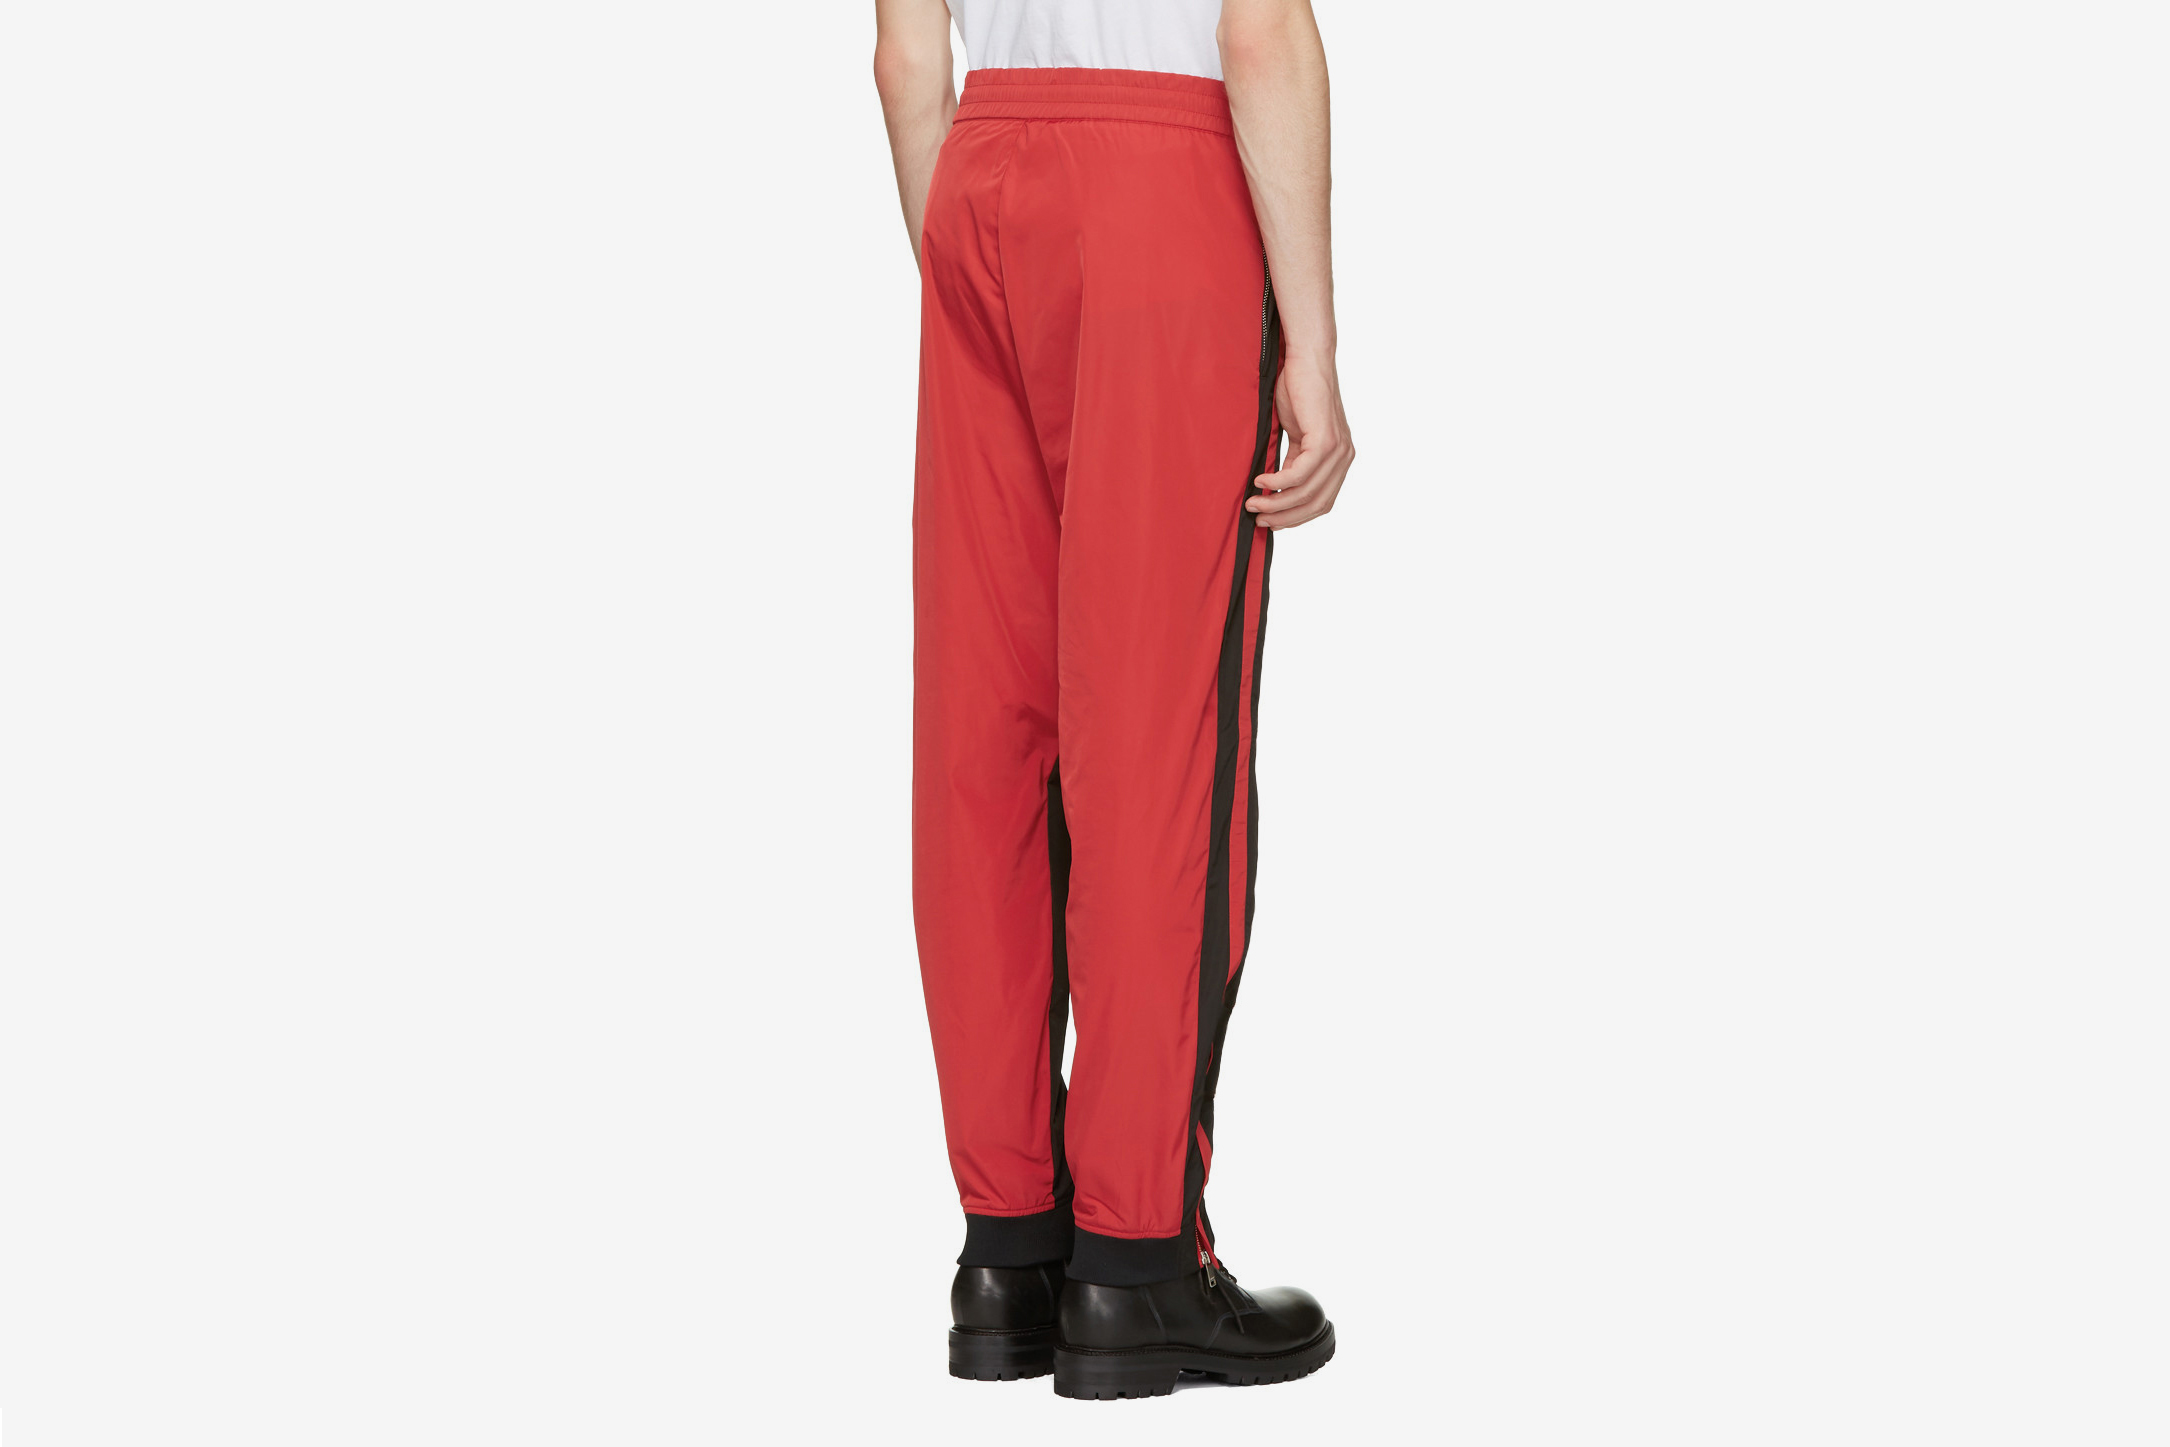 Black & Red Track Pants